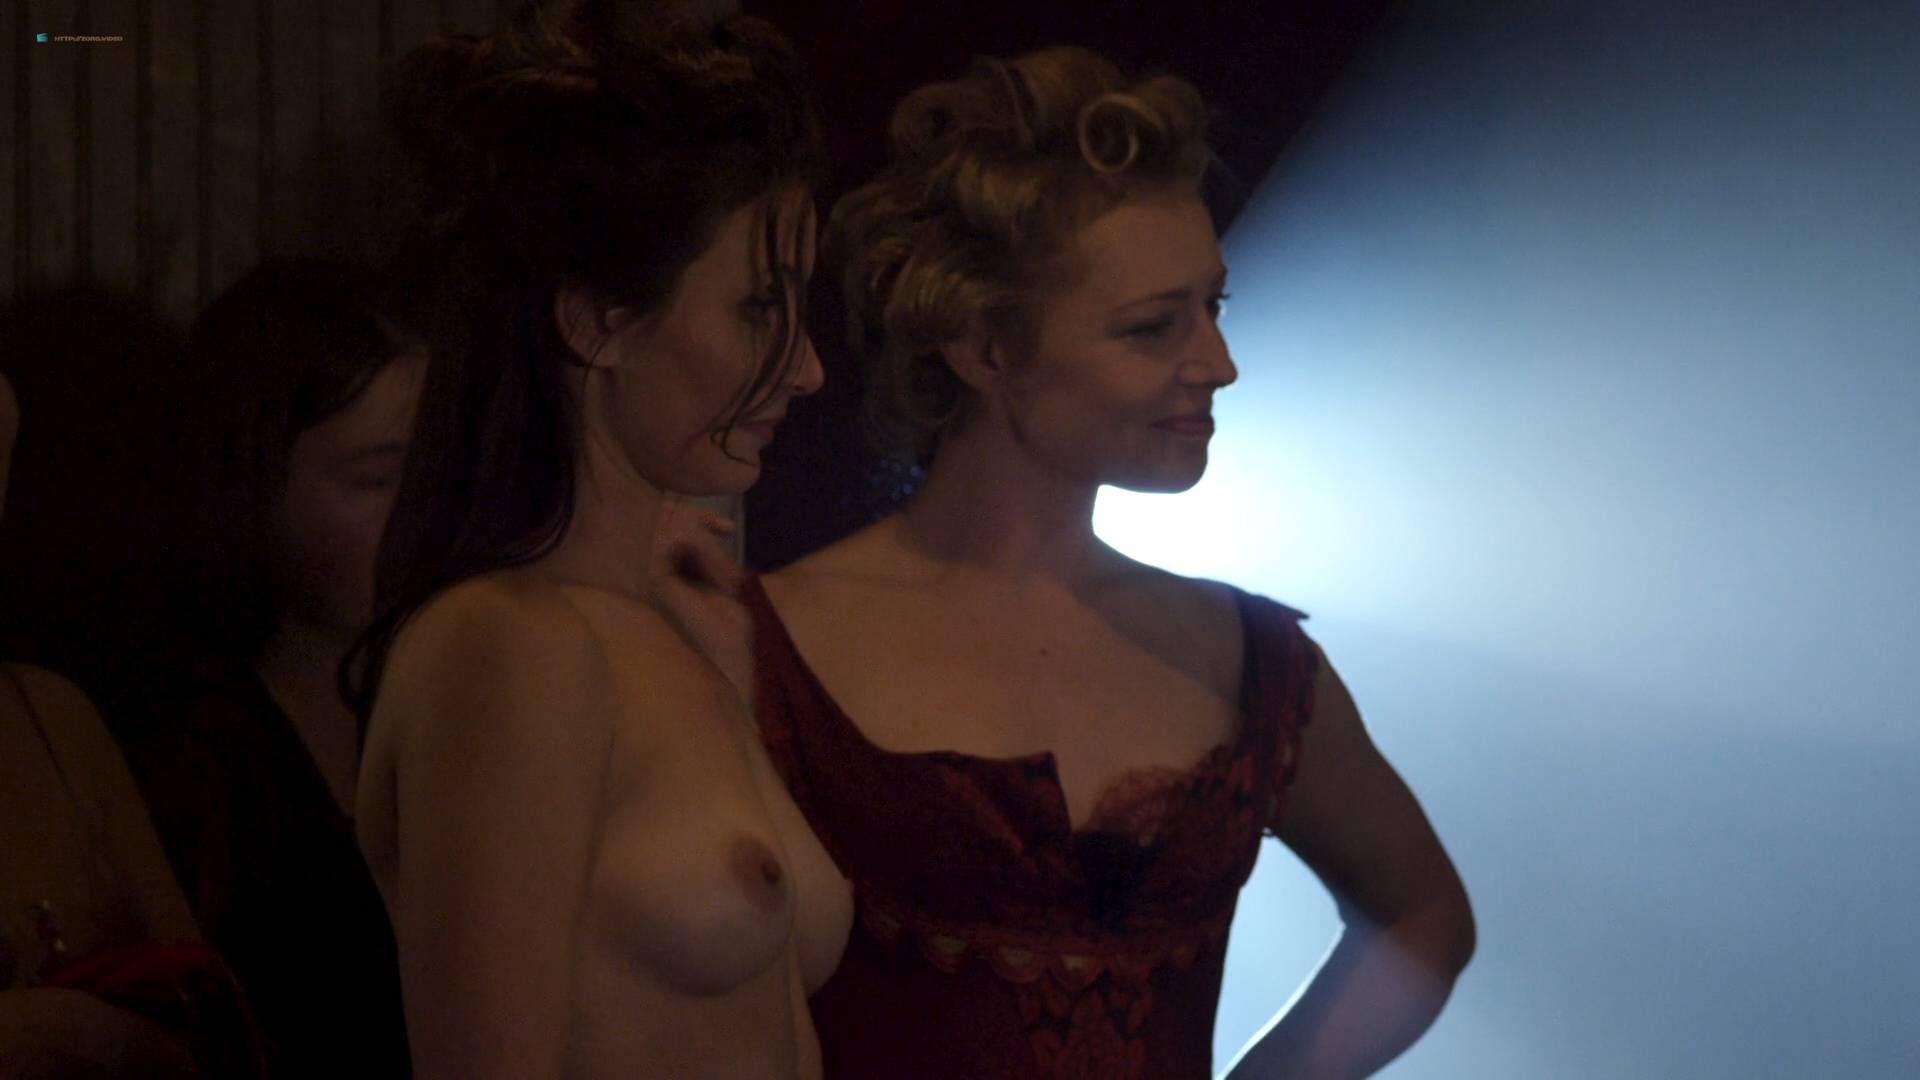 Elizabeth-Lavender-nude-topless-Elysia-Rotaru-nude-butt-boobs-Dead-Again-in-Tombstone-2017-HD-1080p-BluRay-05.jpg